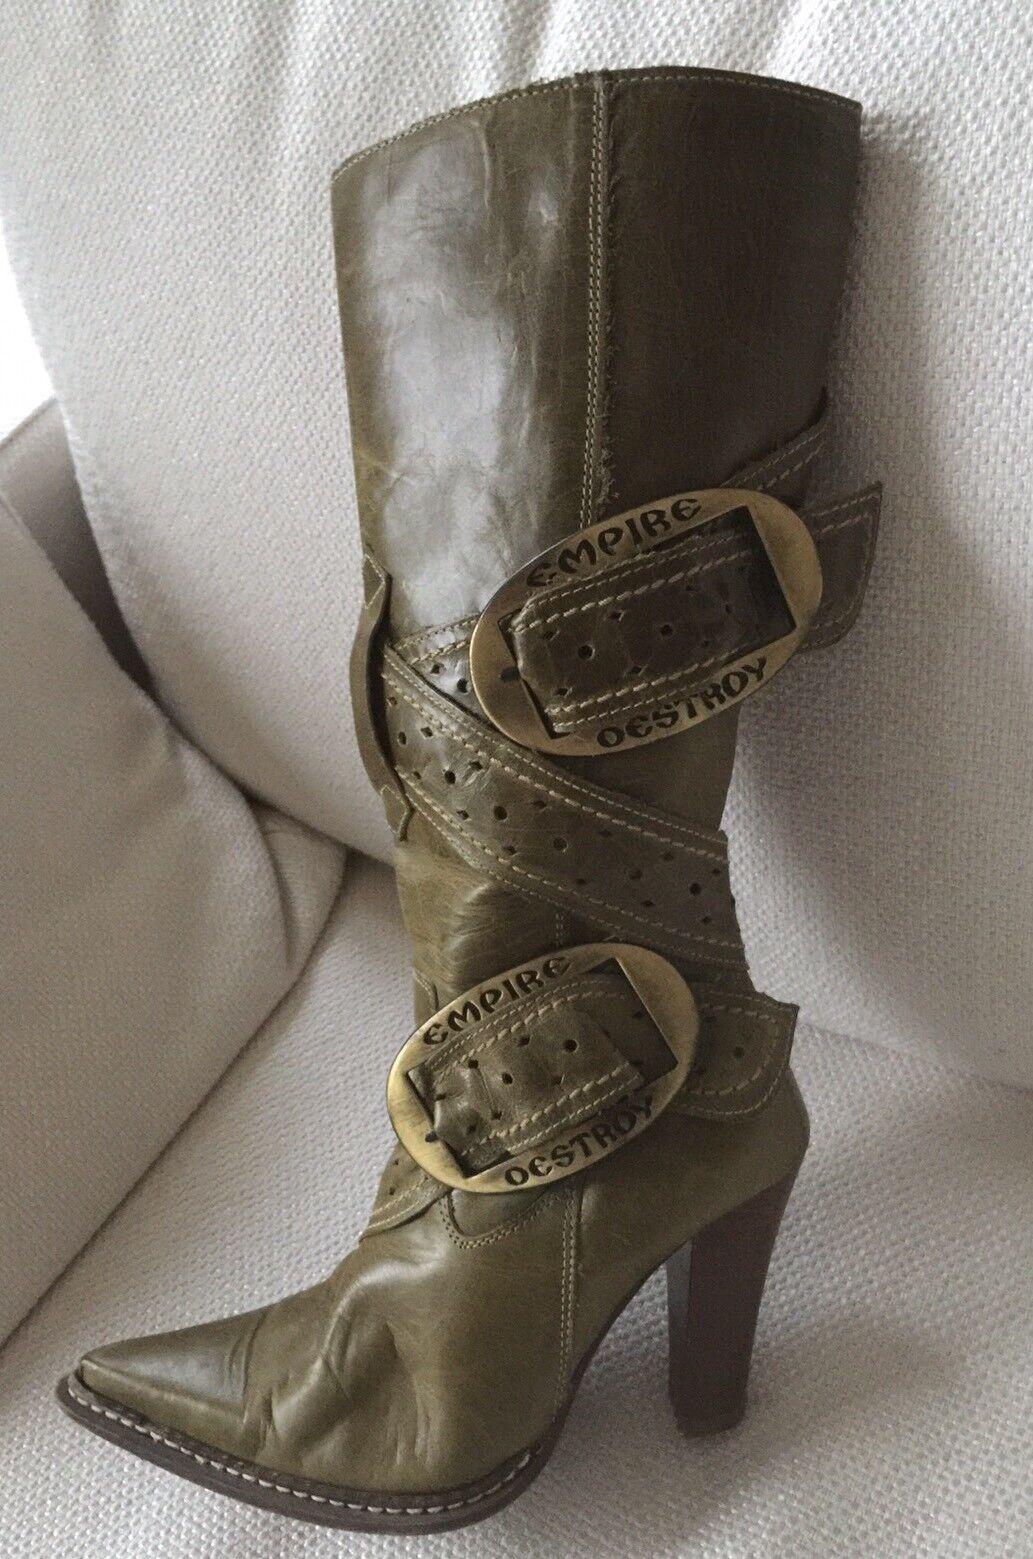 DESTROY Stiefel Leder tannengrün Echtleder 36 Langstiefel grün tannengrün Leder khaki Stiefel a89ceb